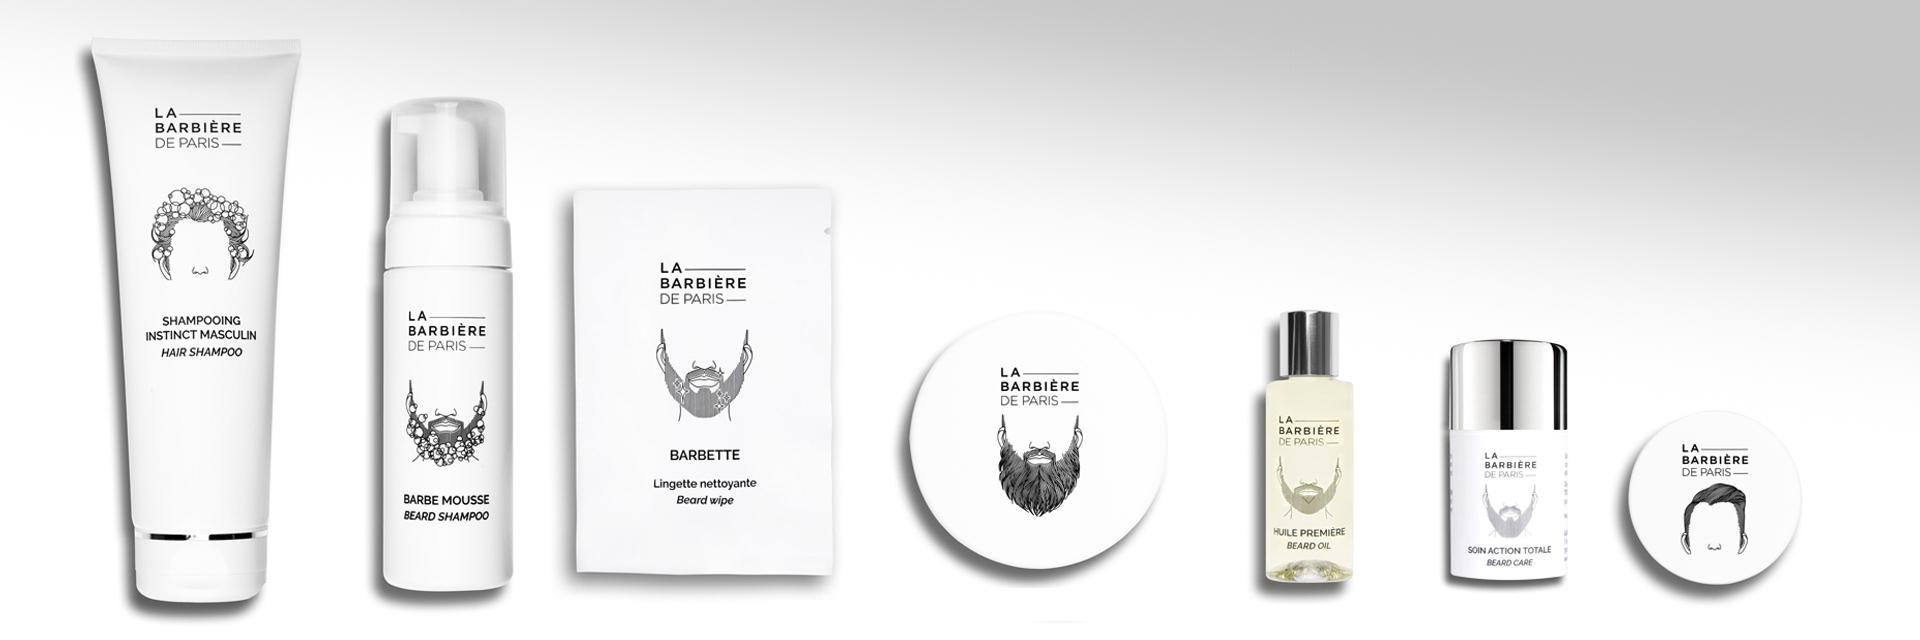 Packshot Graphisme & Photomontage